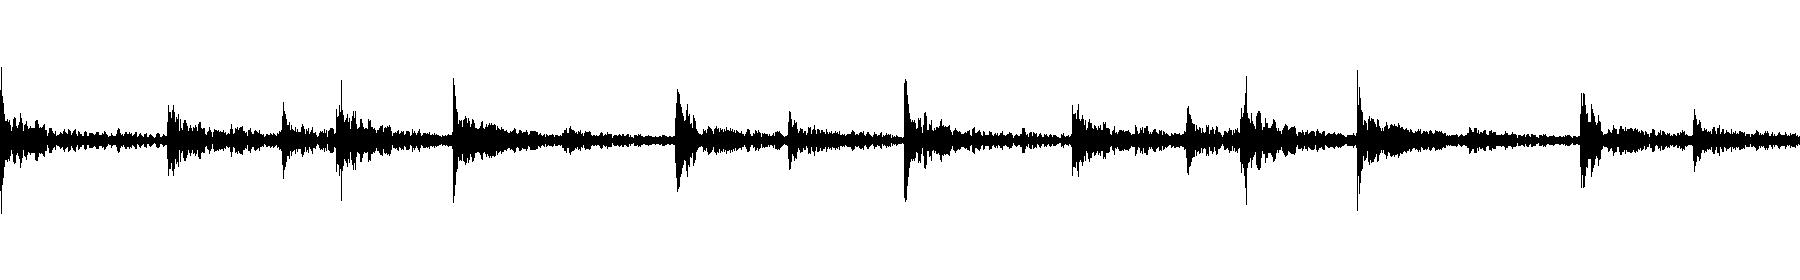 blbc cinedrumsb 75 04